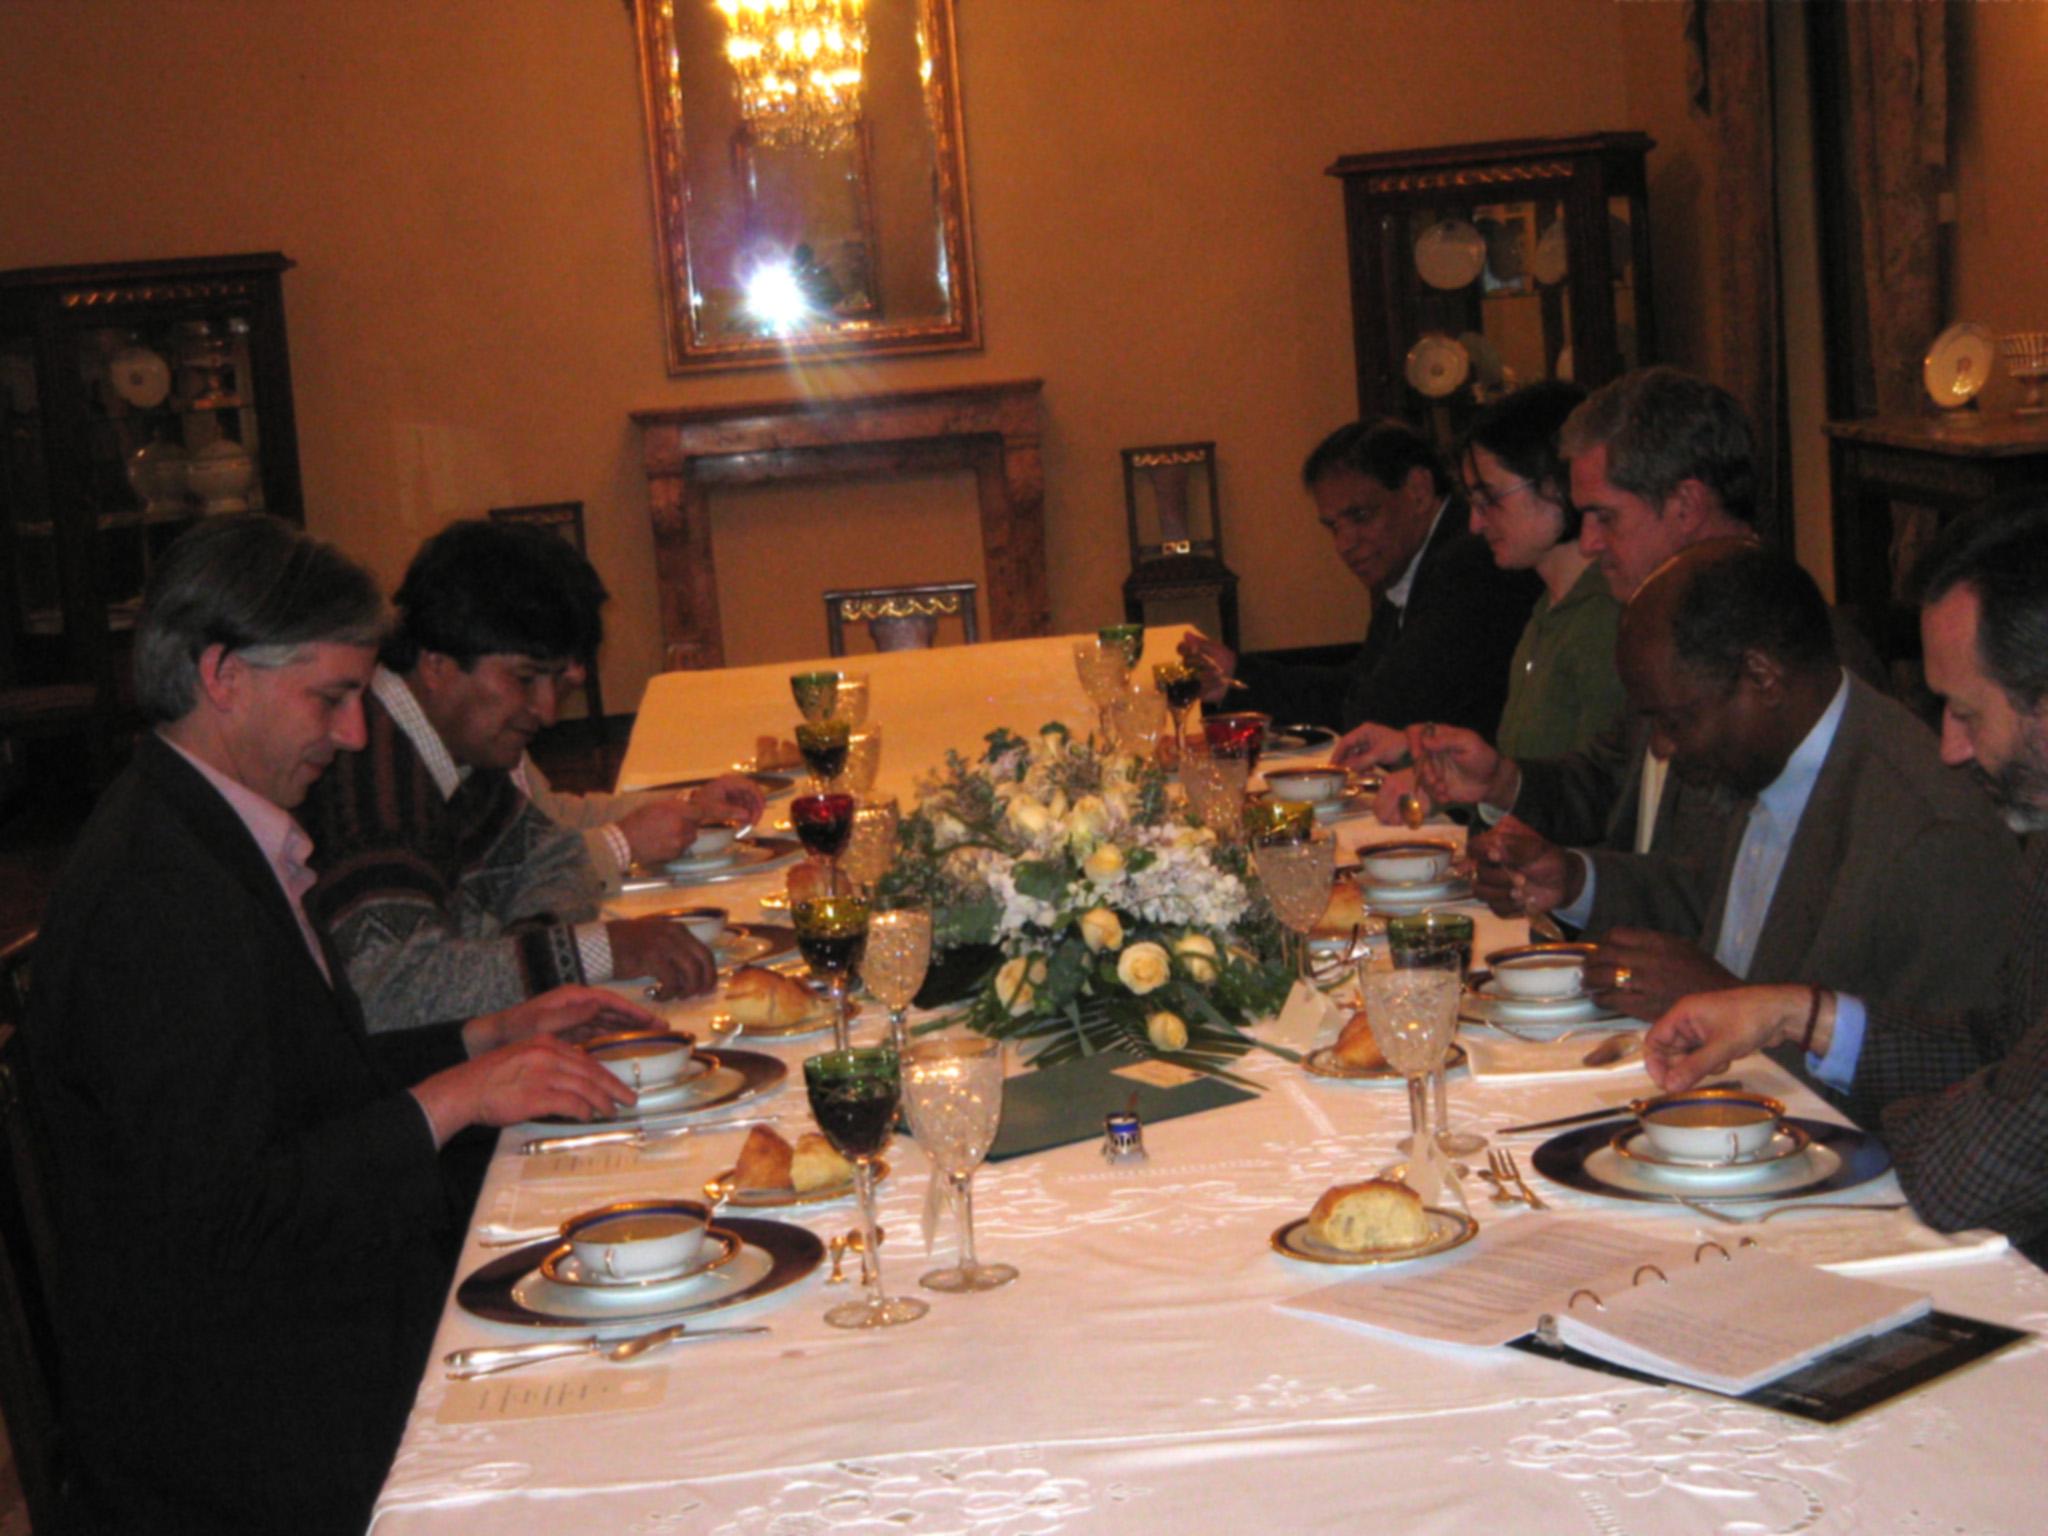 Alvaro García Linera, Evo Morales, Ebrahim Ismail Ebrahim, Orla de Díez, Roelf Meyer, Joaquim Chissano, Fabian Yaksic